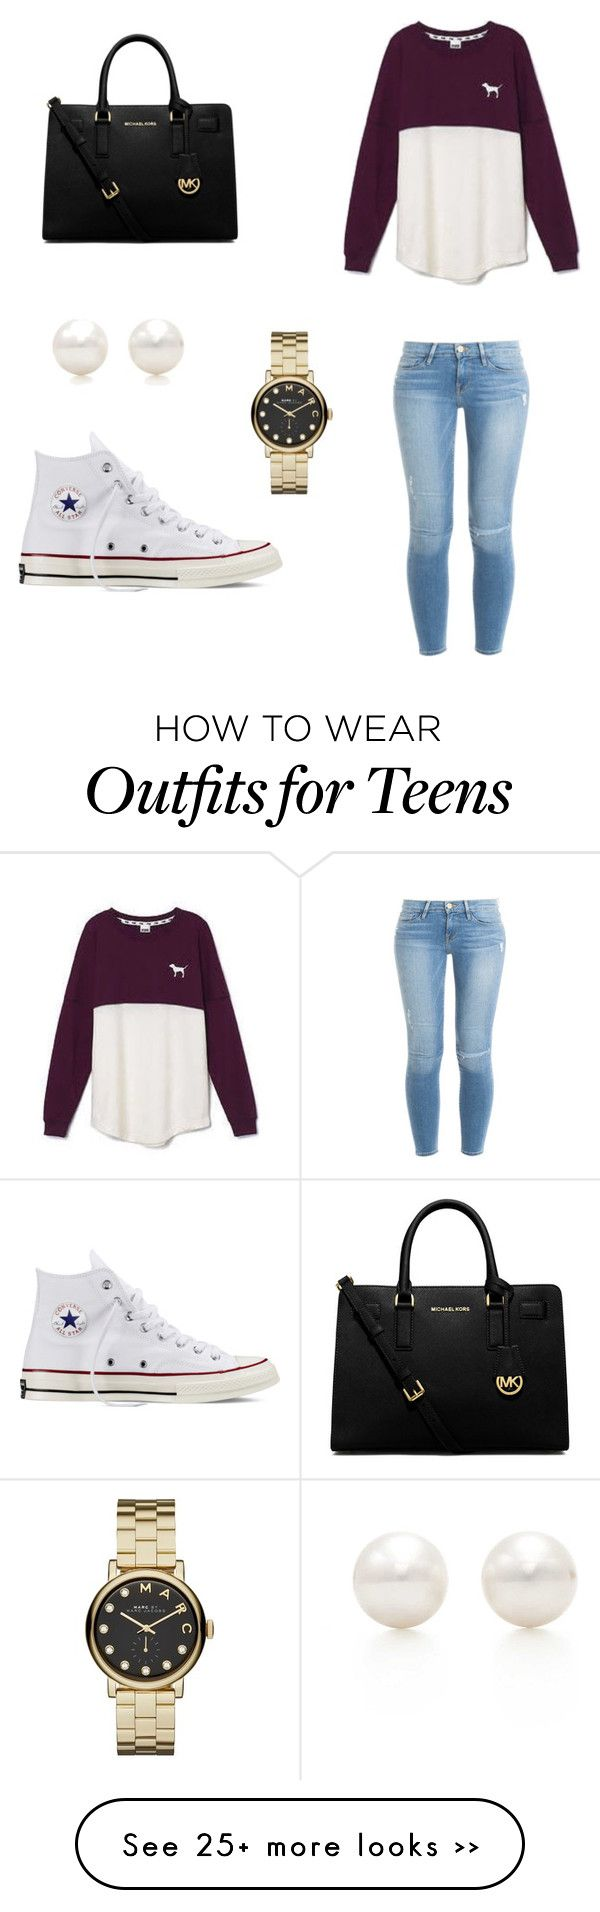 How to dress teenagers